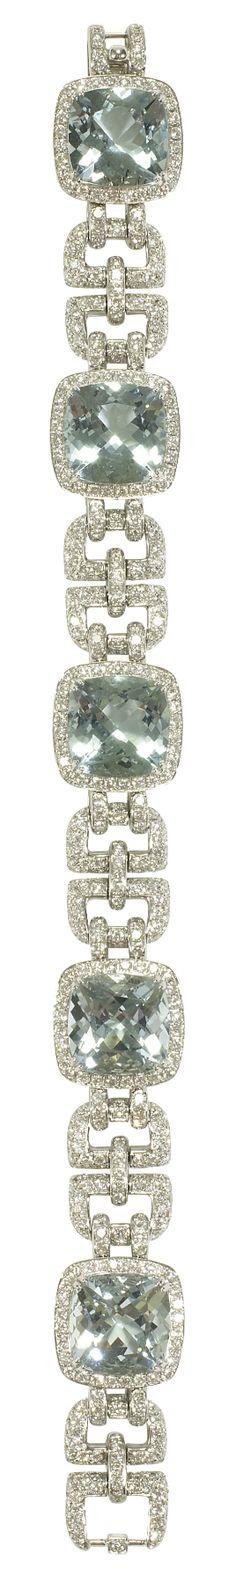 Asprey Windsor Bracelet, Aquamarine. Windsor Bracelet in aquamarine with pavé diamonds and amethysts, set in 18ct white gold.